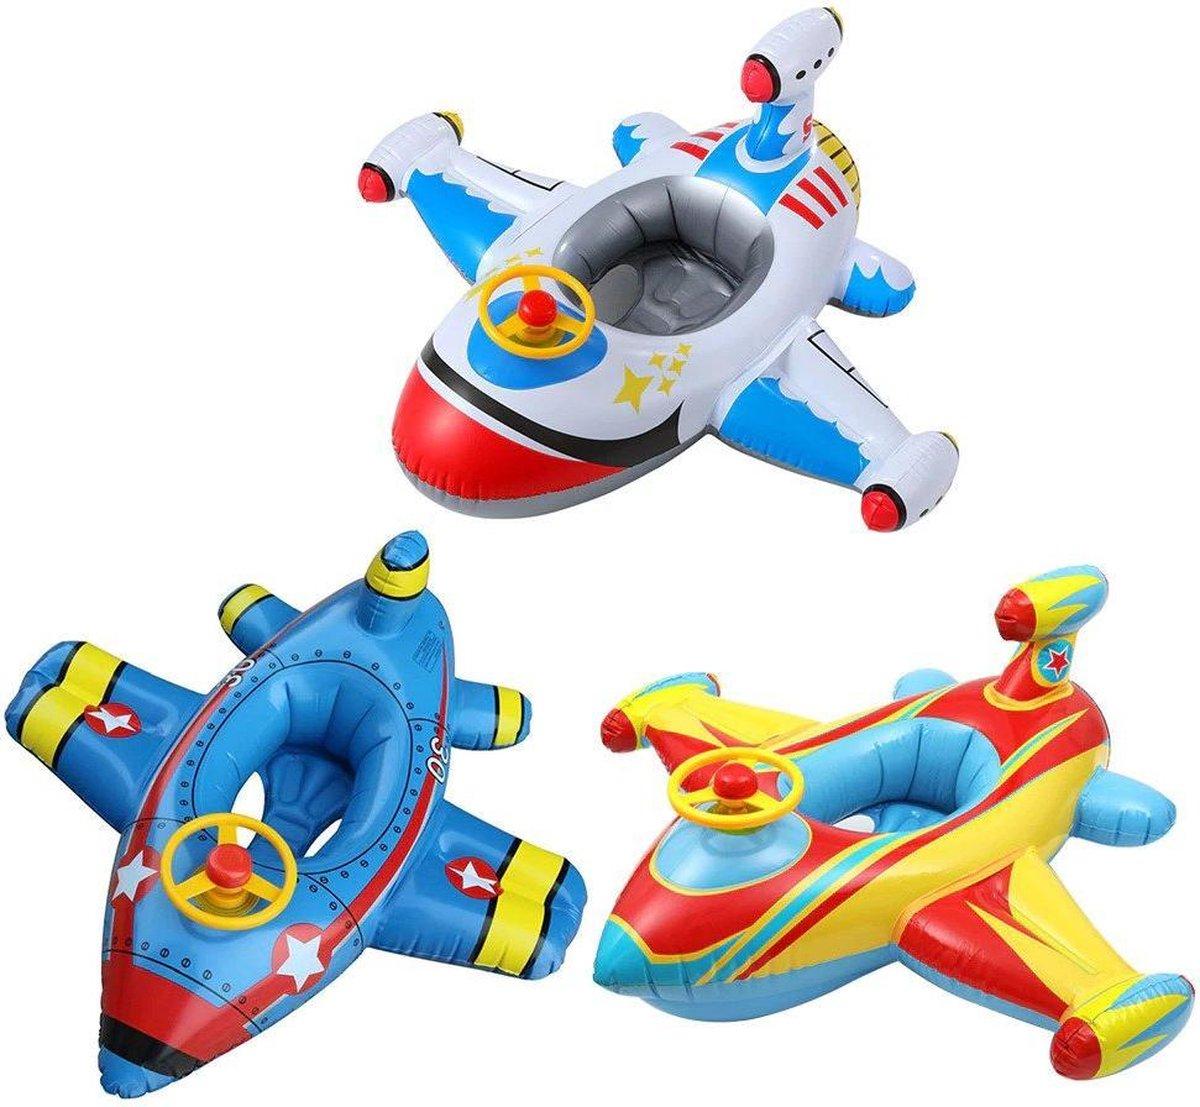 Intex - Opblaasfiguur - Voertuig - Vliegtuig - Bootje - Opblaasbare Blauwe Vliegtuig met stuur en toeter - Zwemspeelgoed - Peuter Speelgoed - Zwemband -